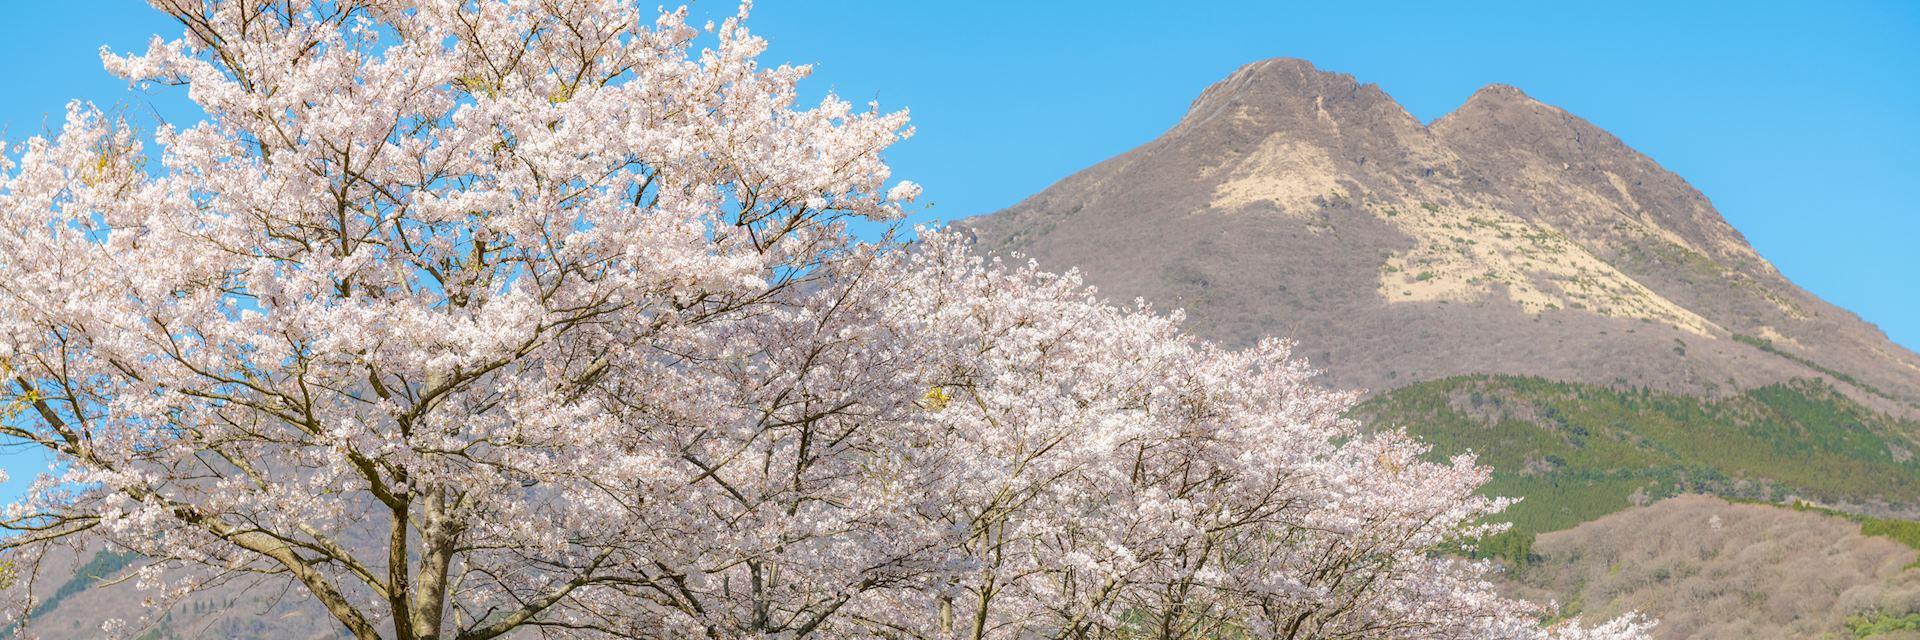 Mount Yufudake